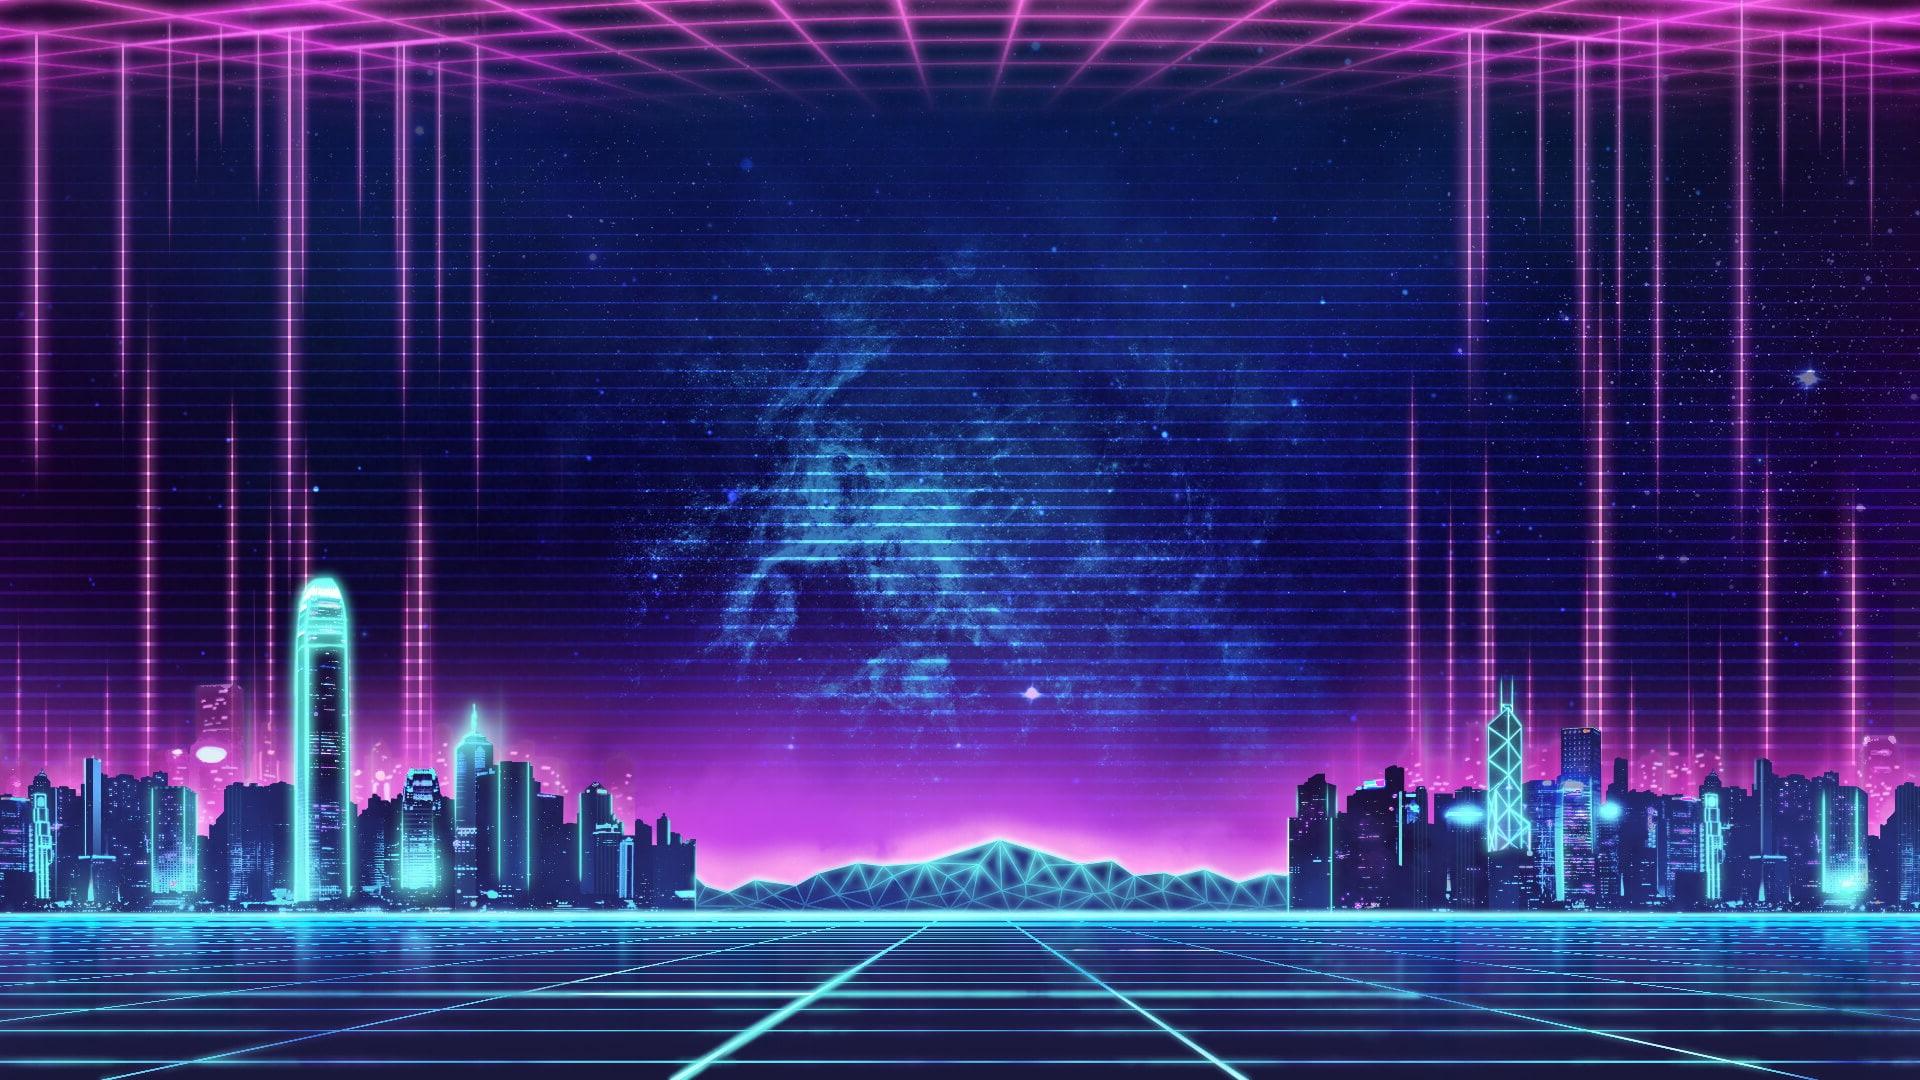 Neon pc wallpaper